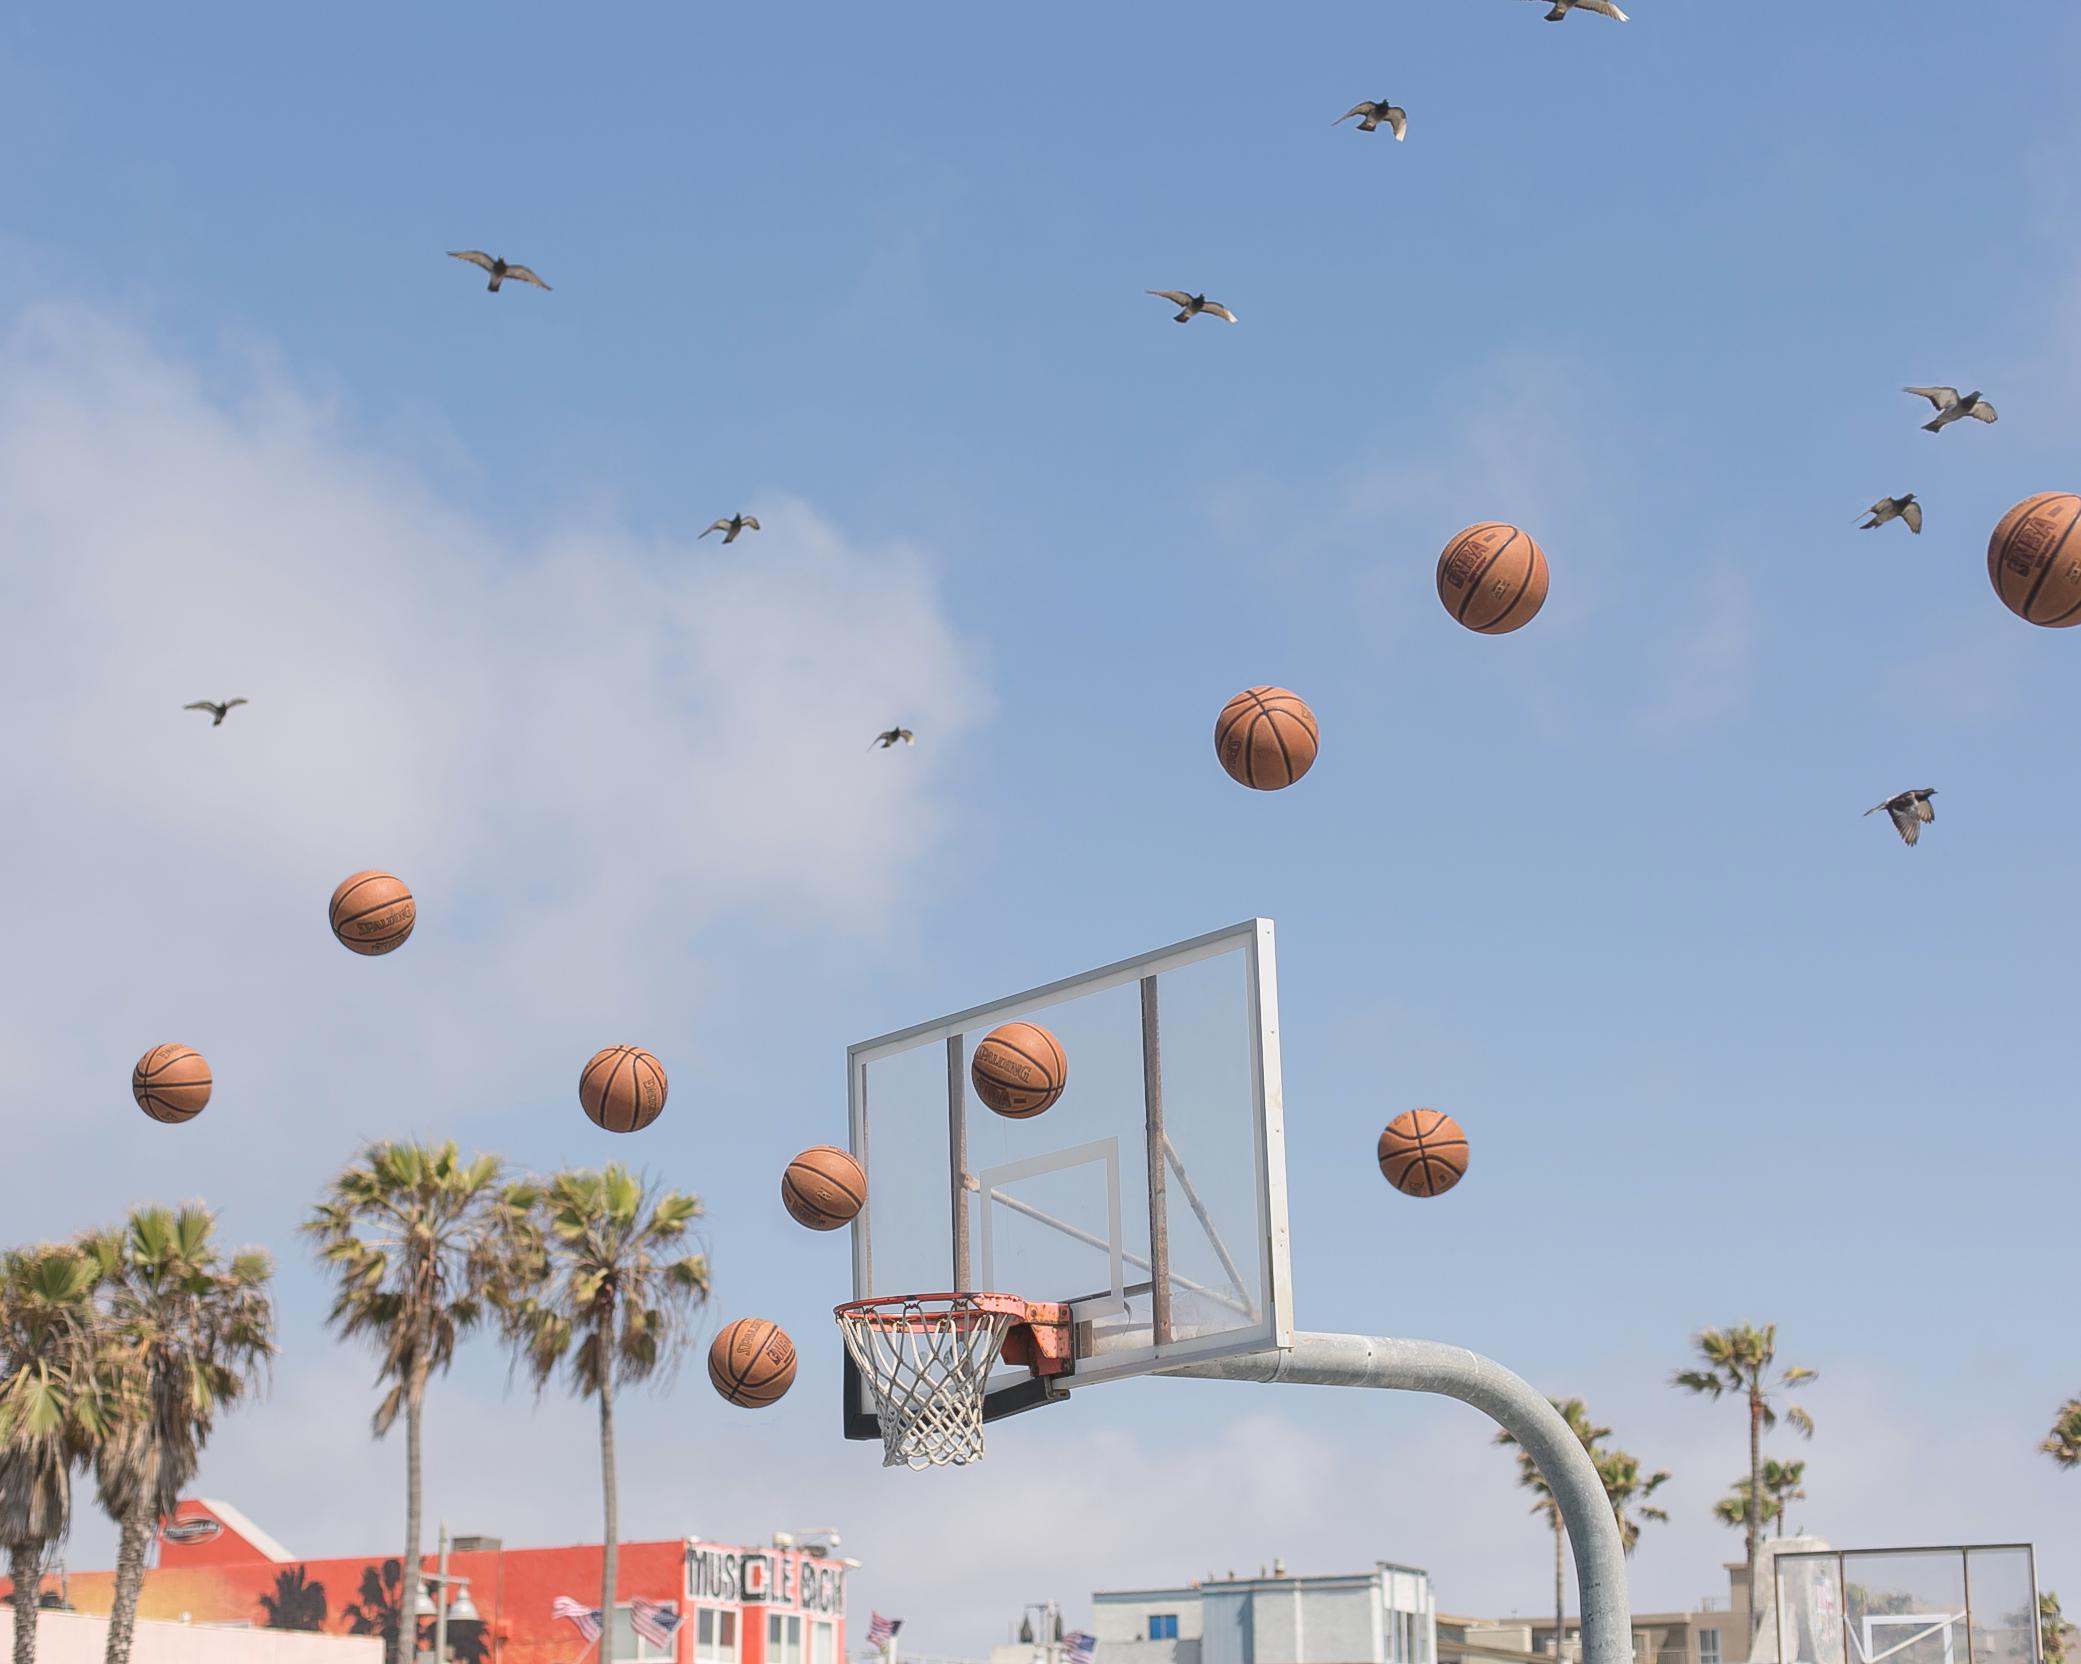 """Hoop Dreams"" / Venice, CA / May 2016"